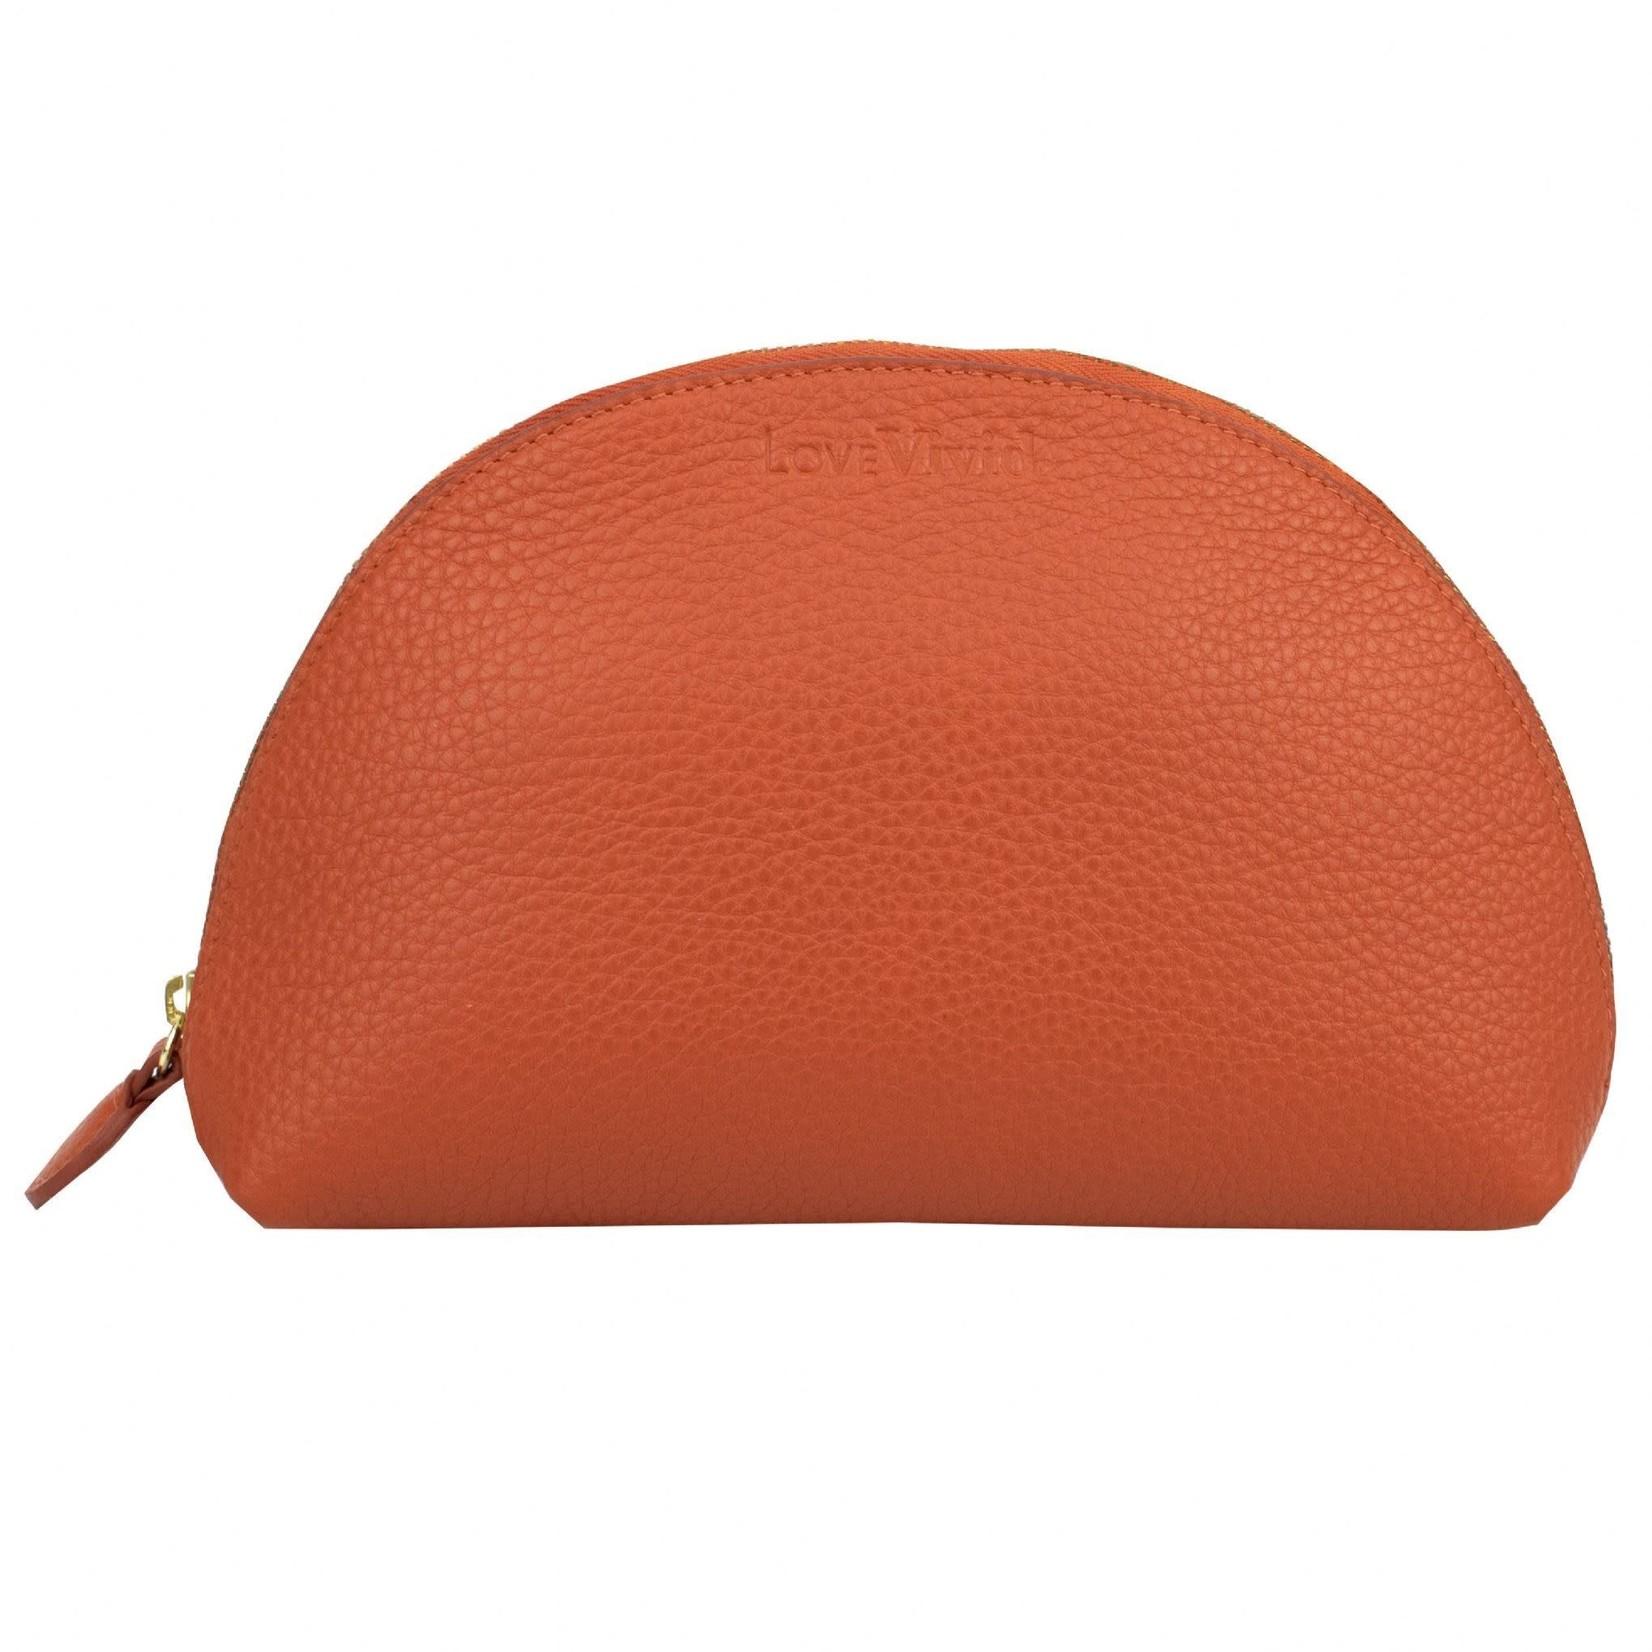 Vivid Cosmetic Bag in Orange